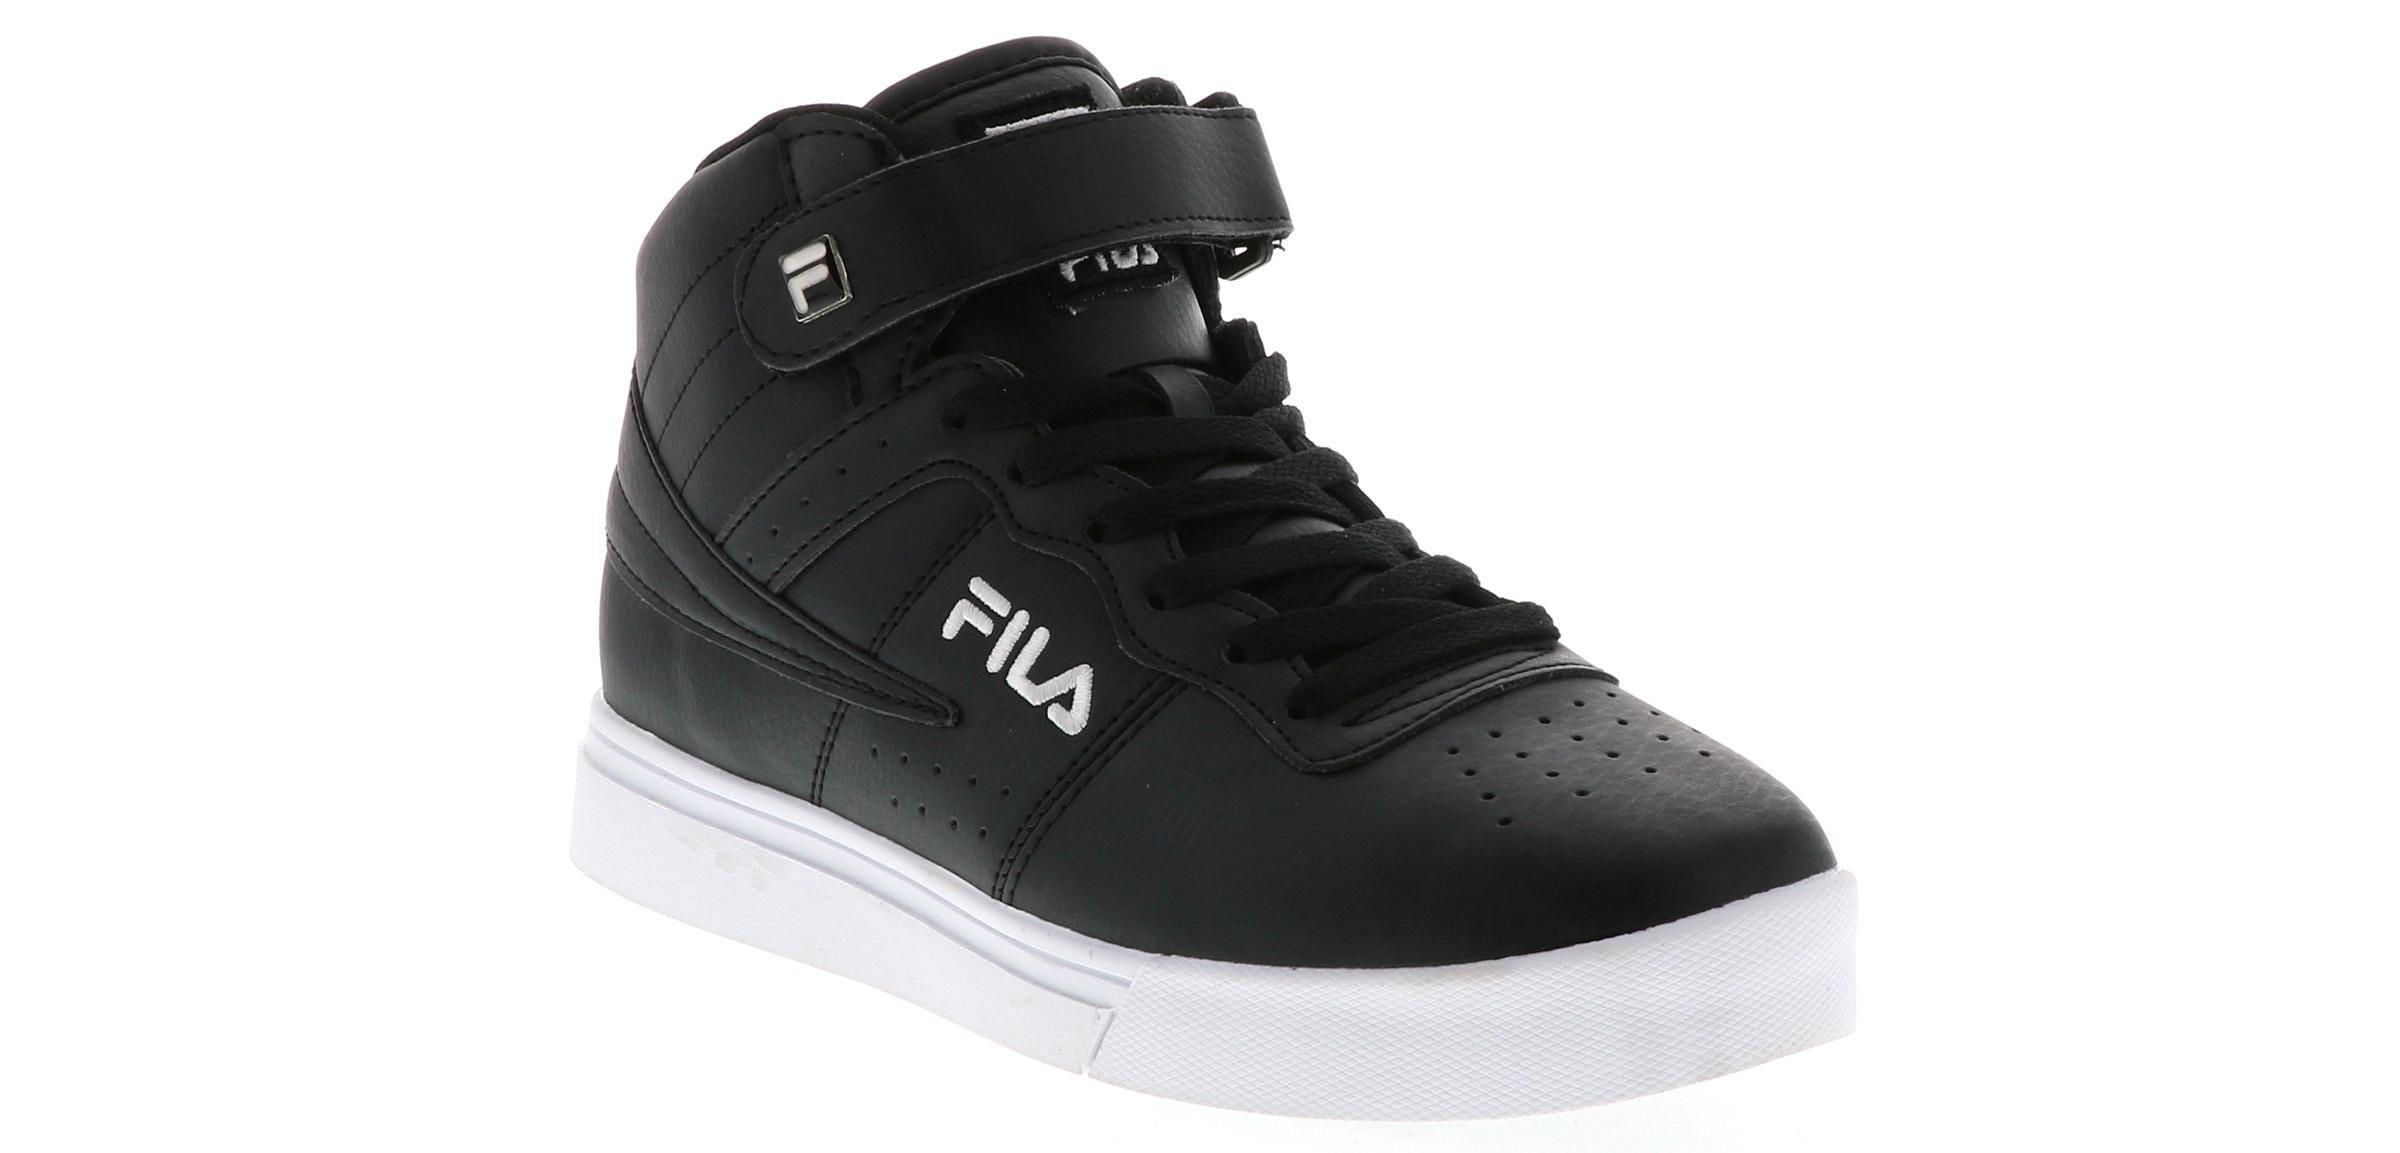 Men's Fila Vulc 13 Mid Plus Black Shoe Sensation  Shoe Sensation